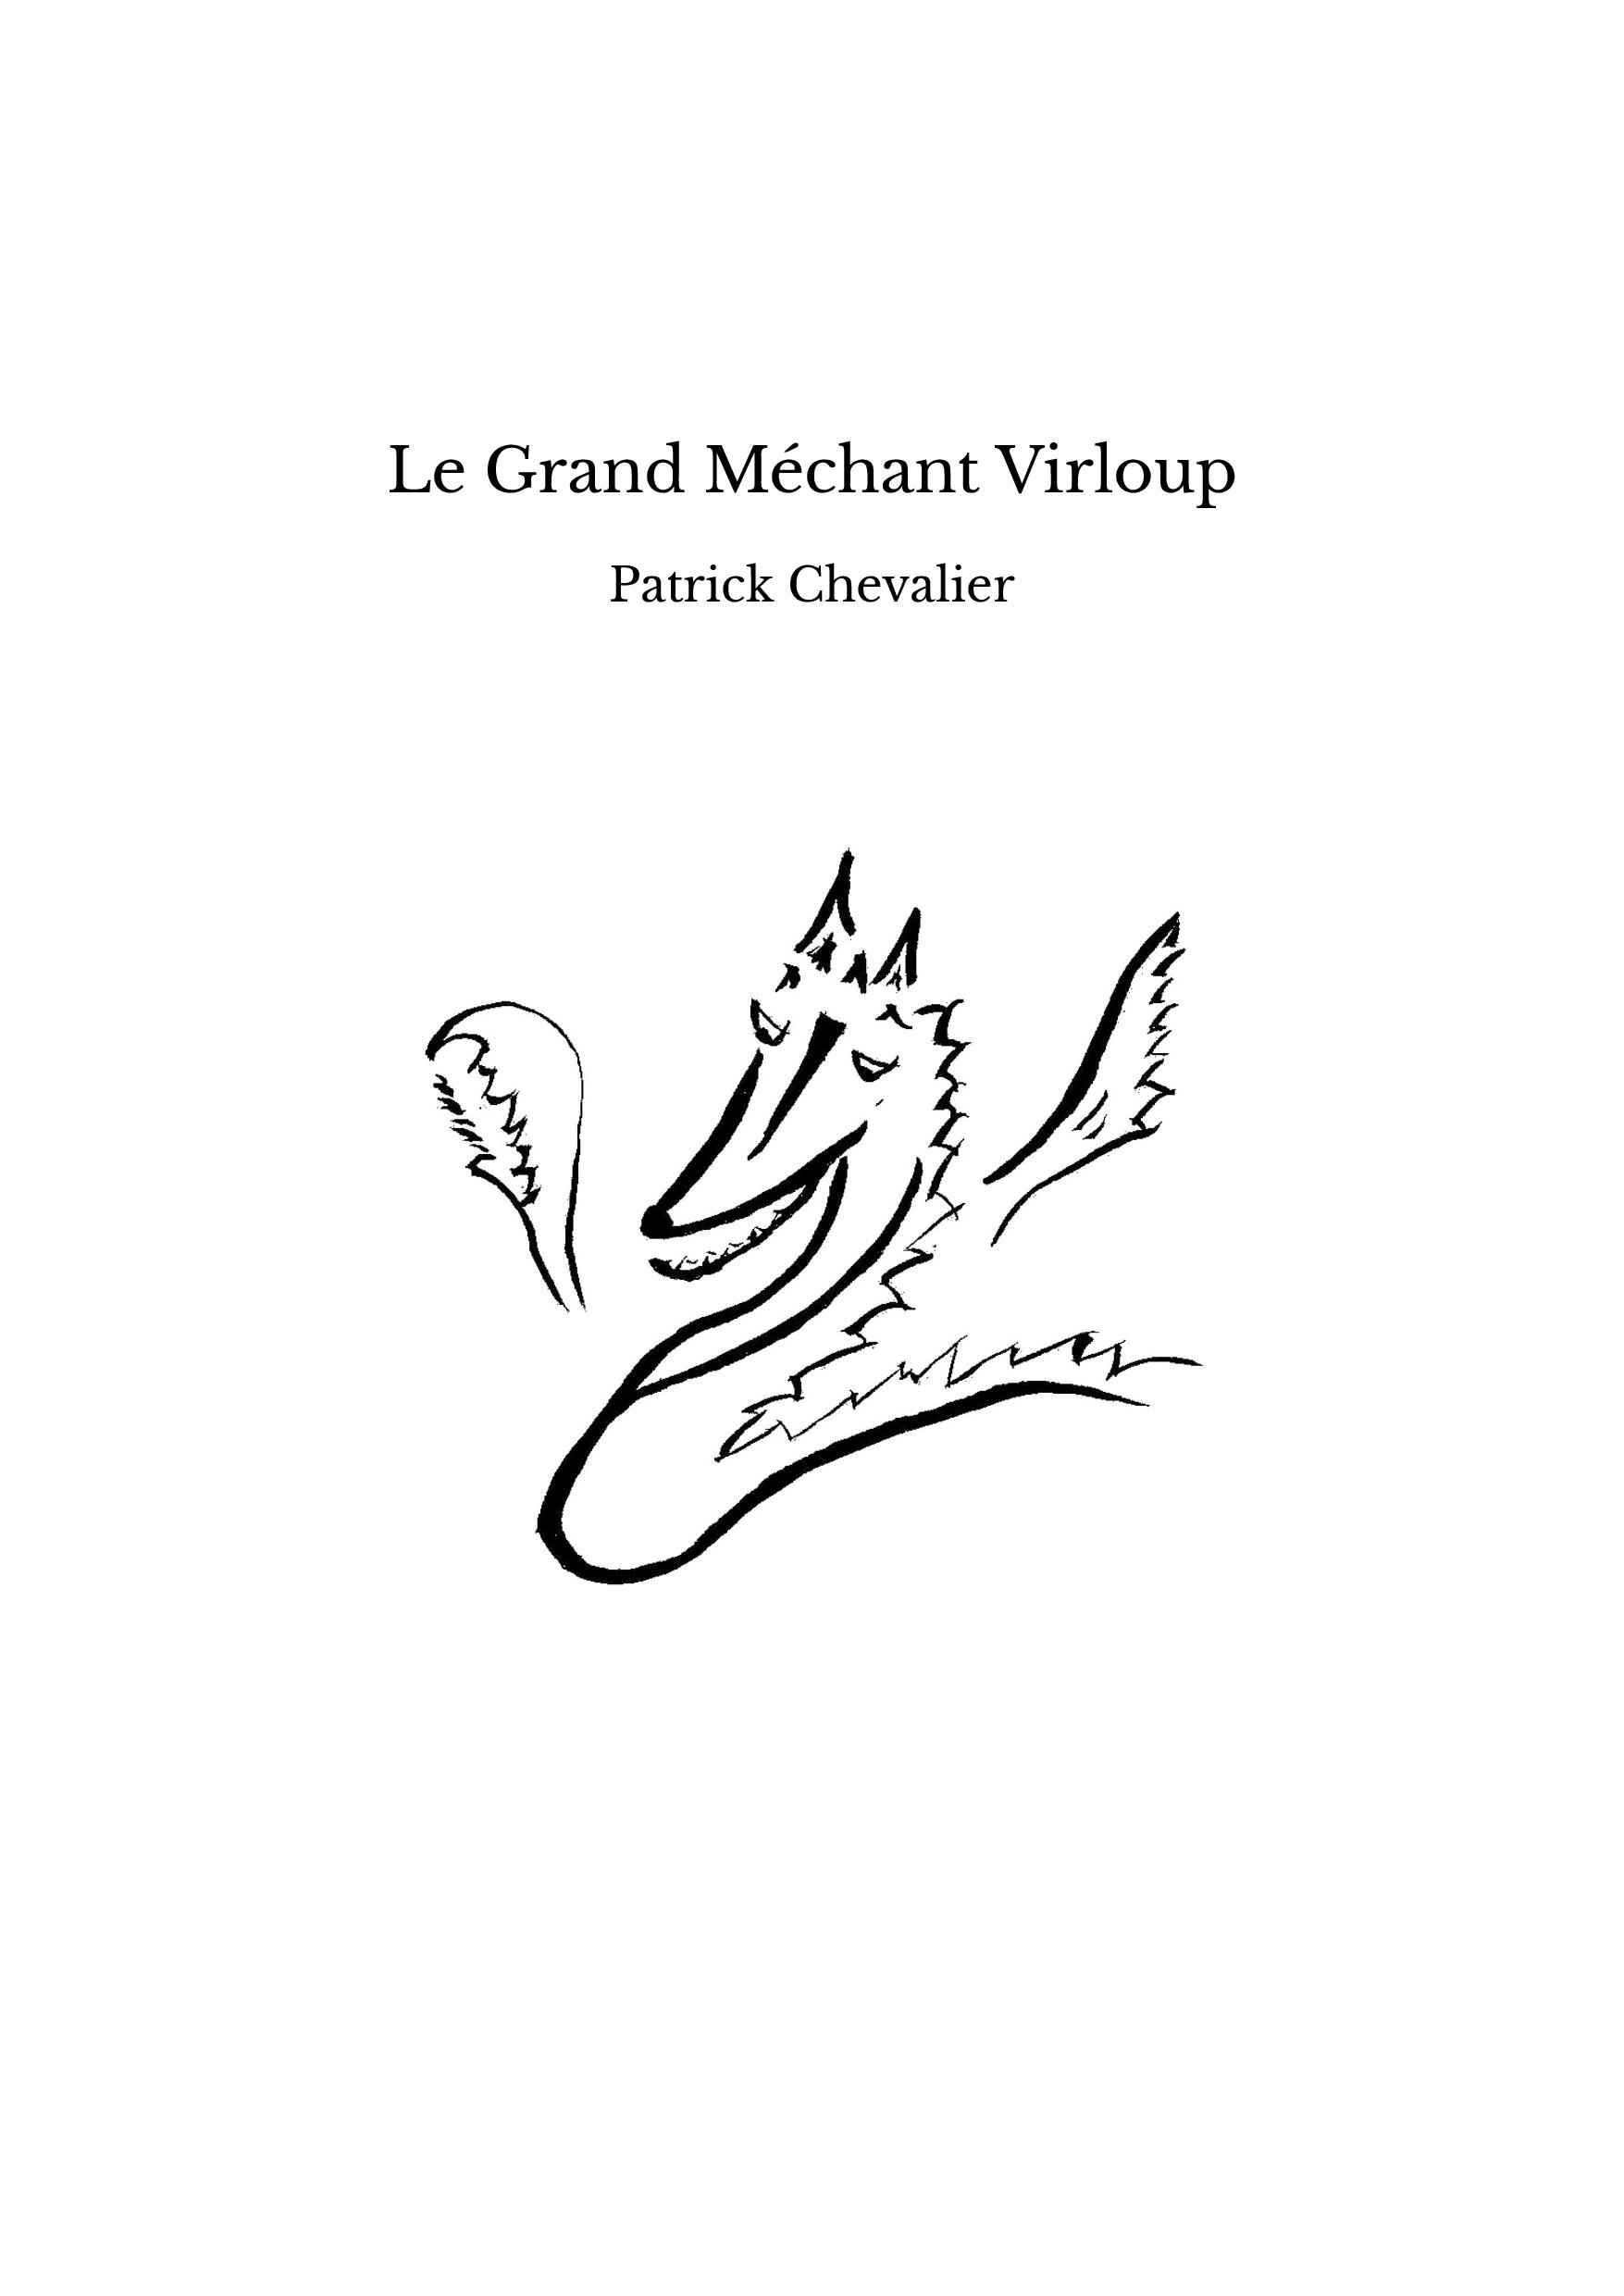 Le Grand Méchant Virloup